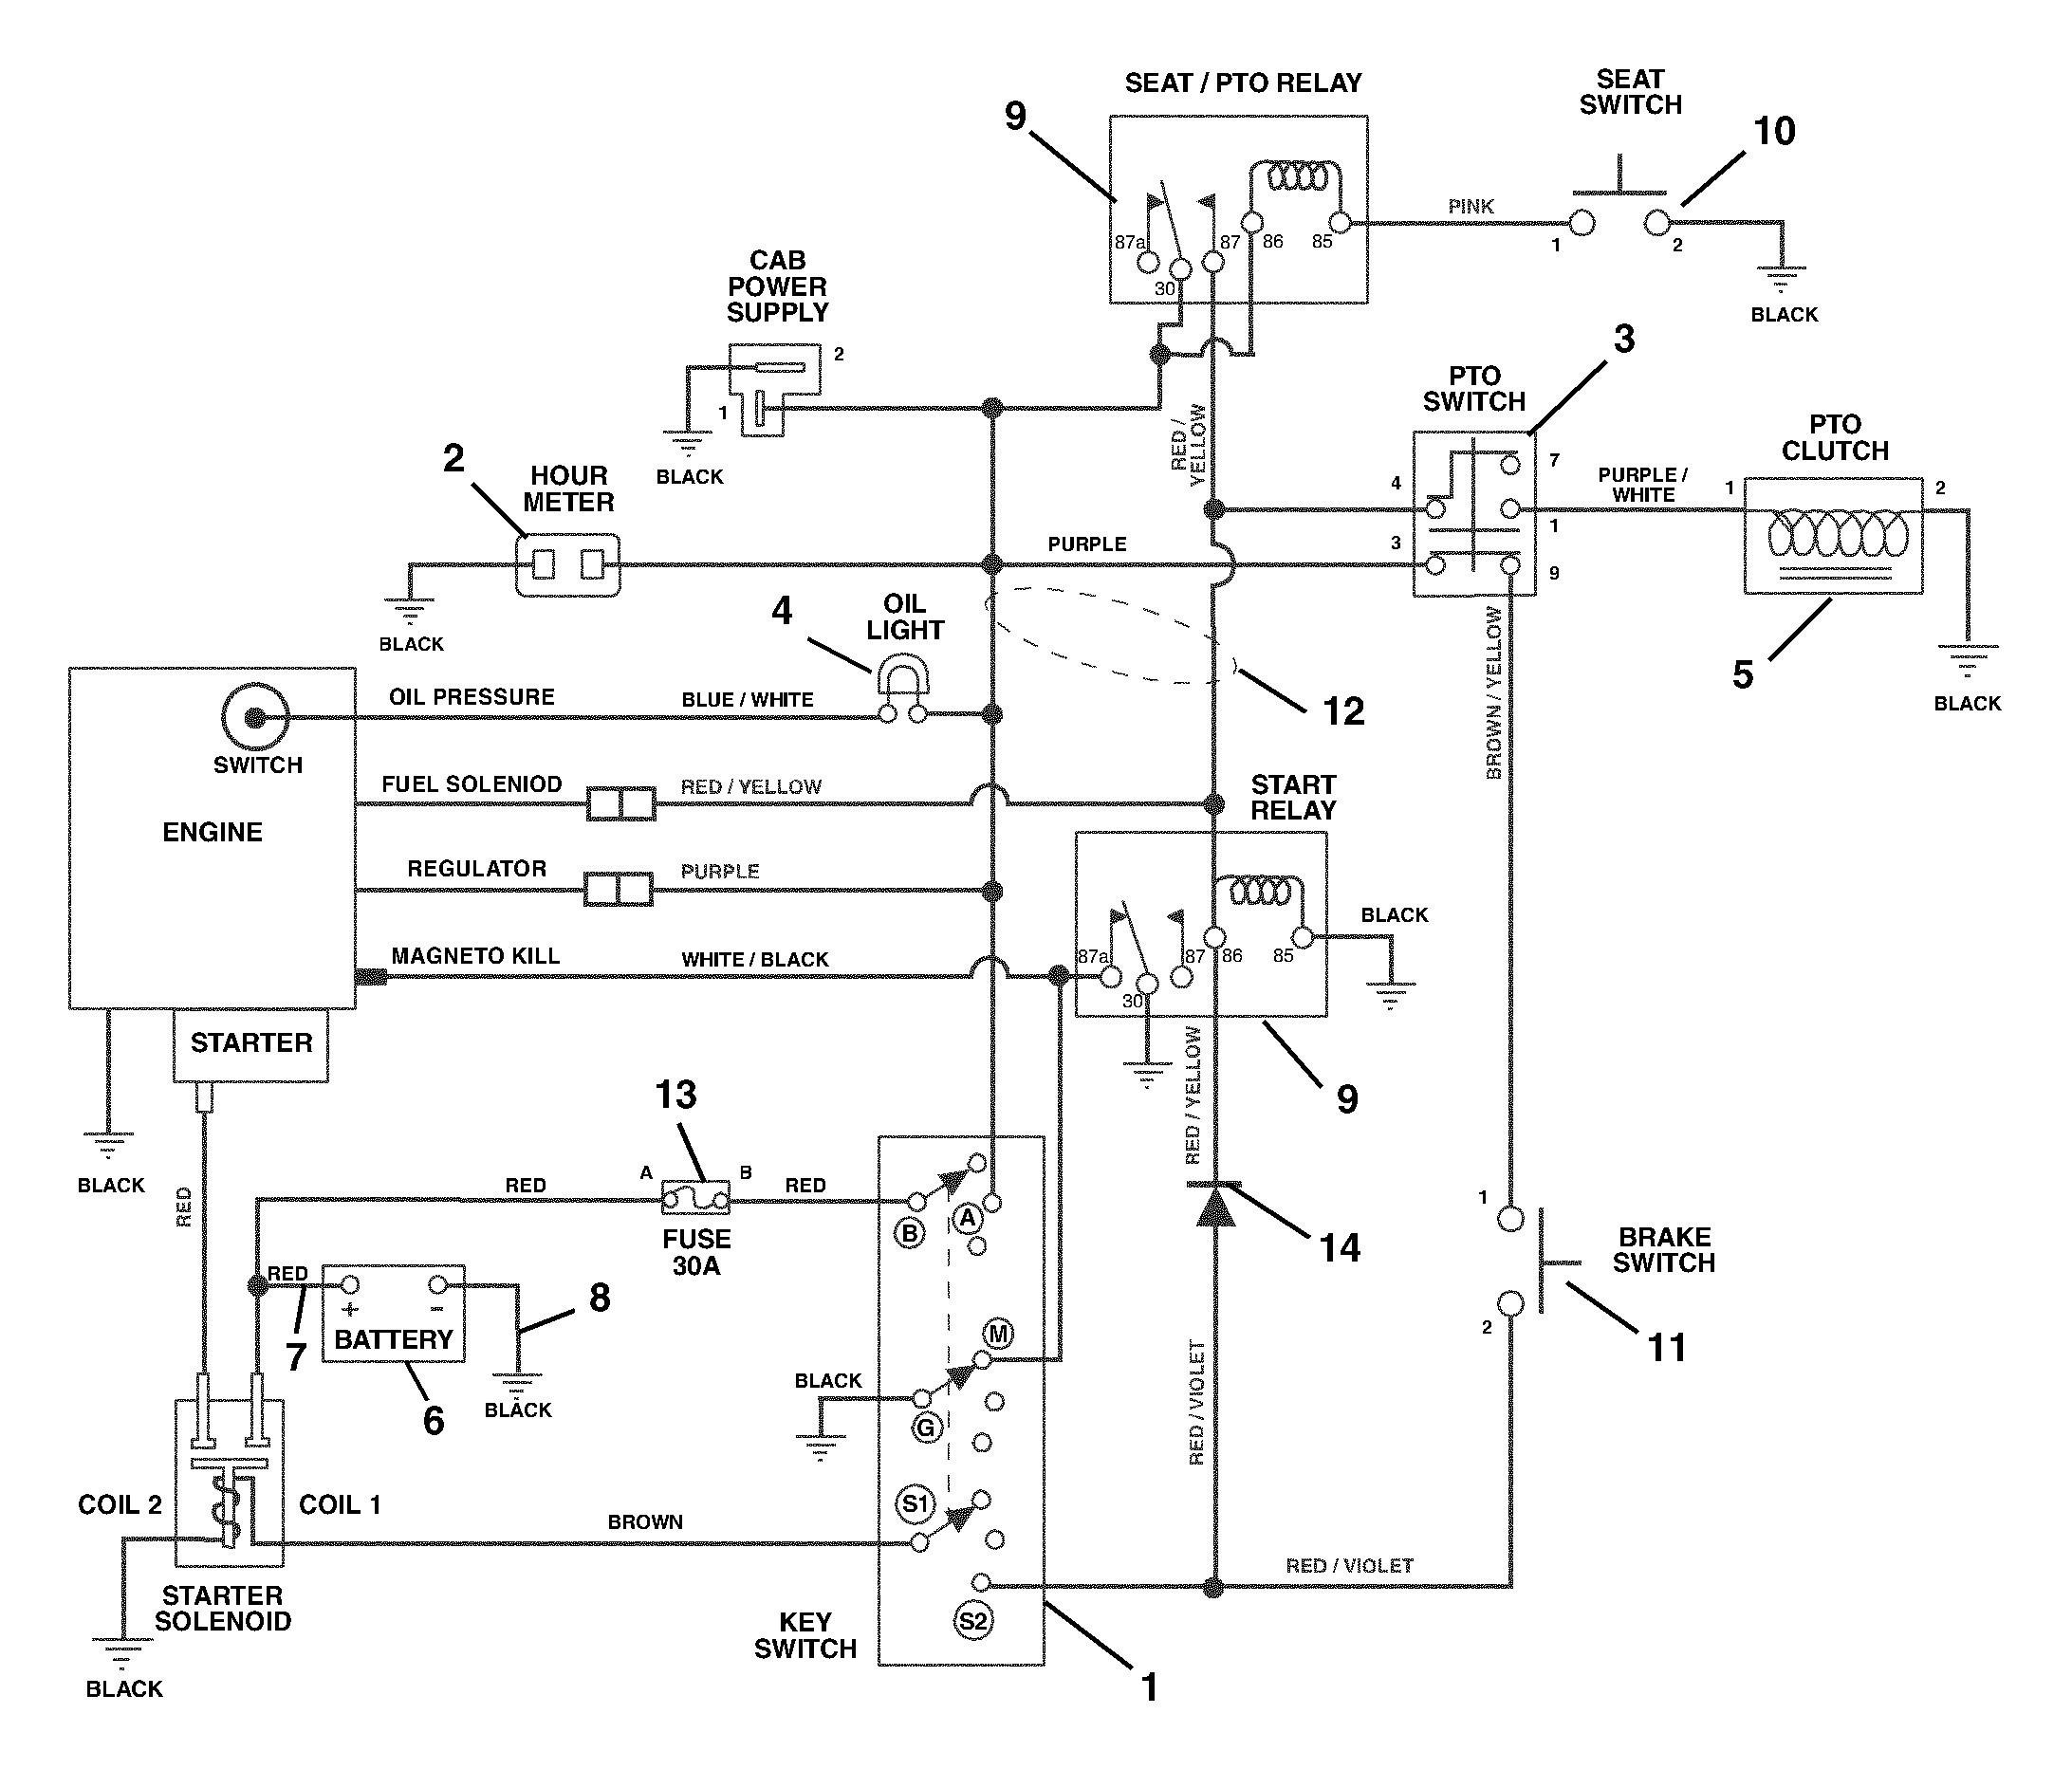 briggs and stratton stator wiring diagram explained wiring diagrams rh dmdelectro co Briggs and Stratton Magneto Wiring 300 421 Briggs and Stratton Magneto Wiring 300 421